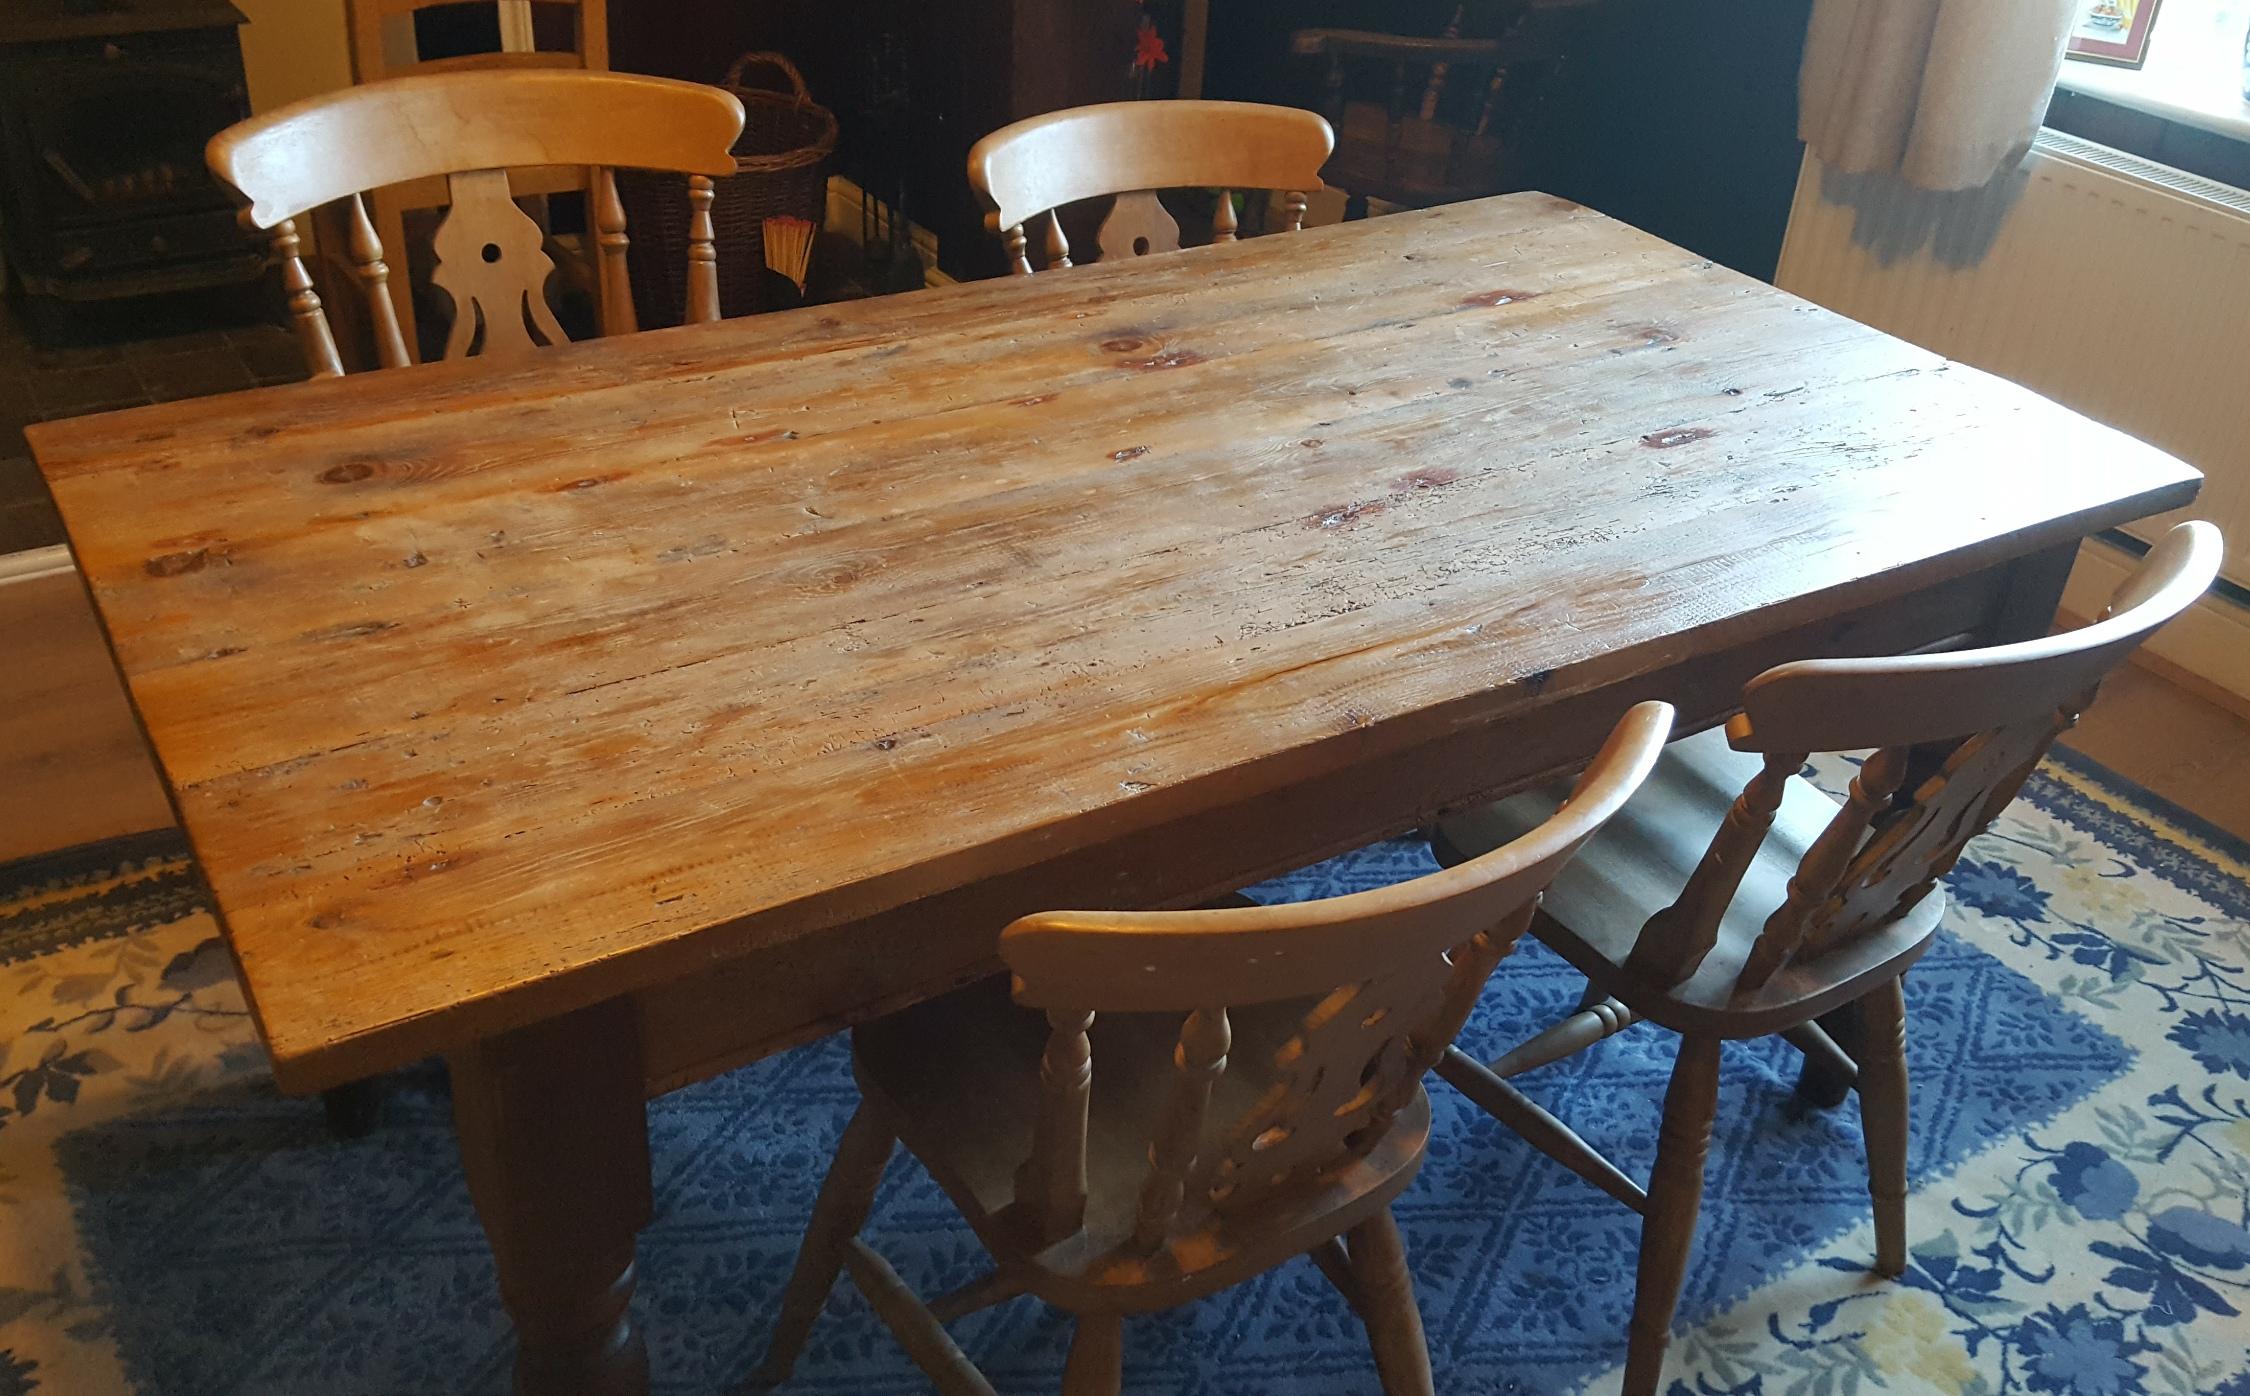 Lot 23 - Vintage Farmhouse Table & Chairs